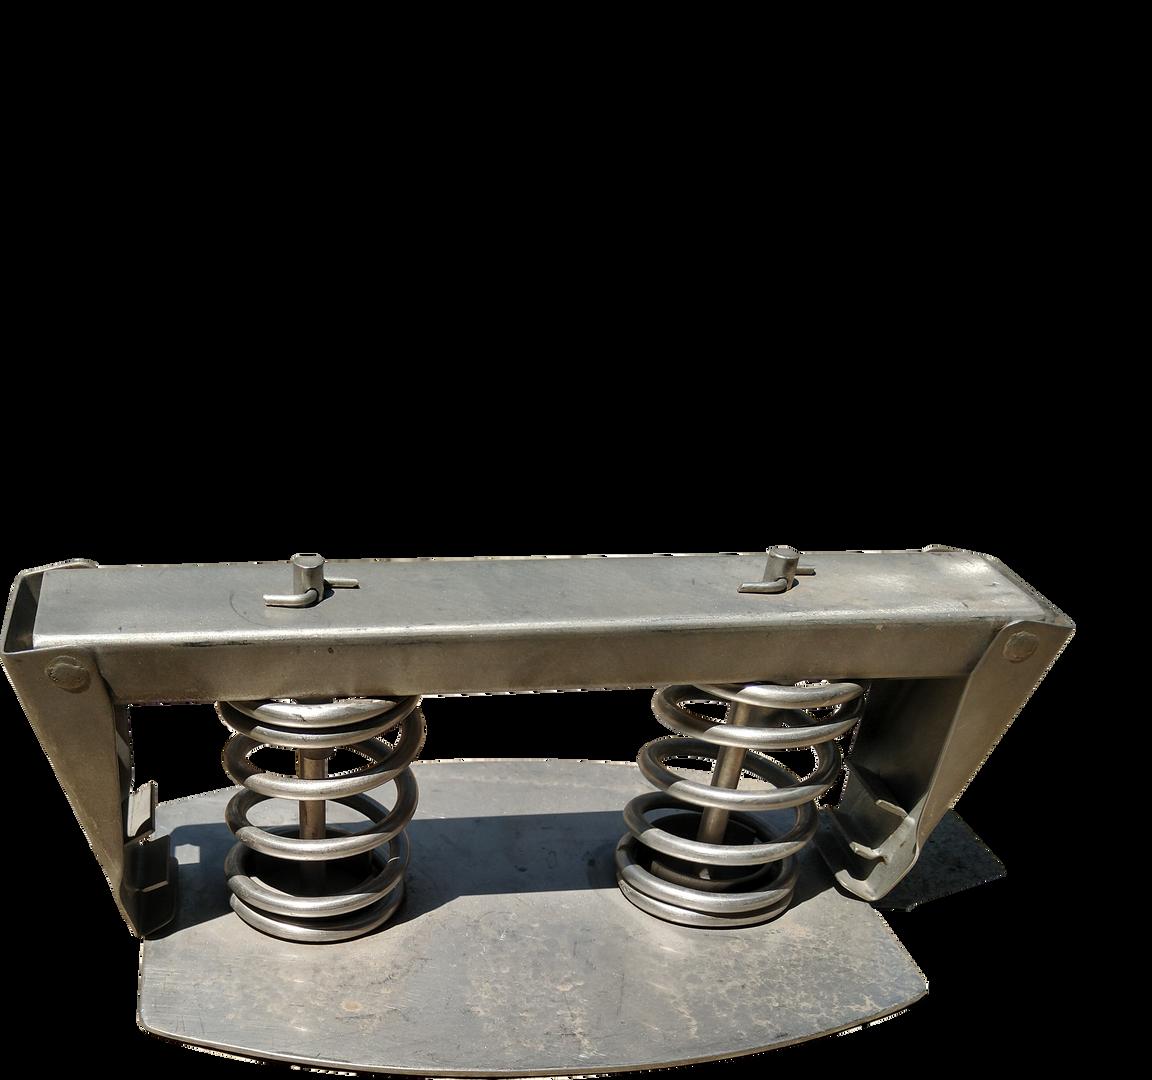 barril o tortugo 3.png